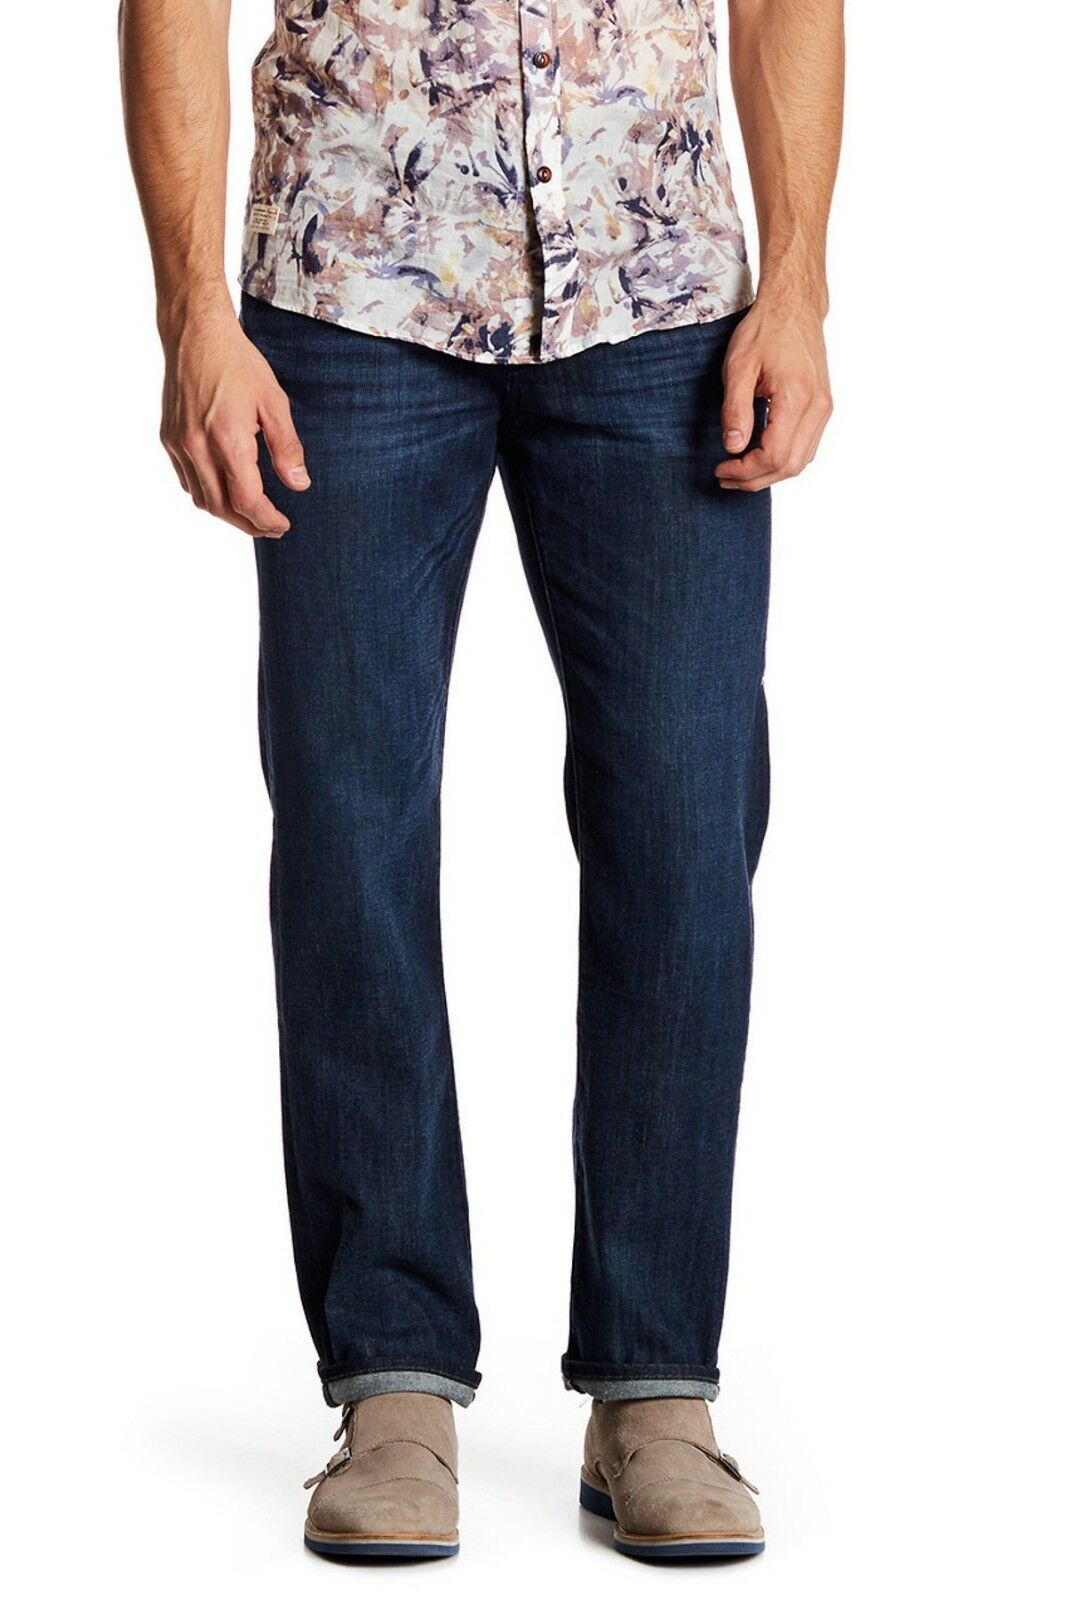 7 For All Mankind Standard Straight Leg Denim Jeans, Dark wash, 38X34,  NWOT